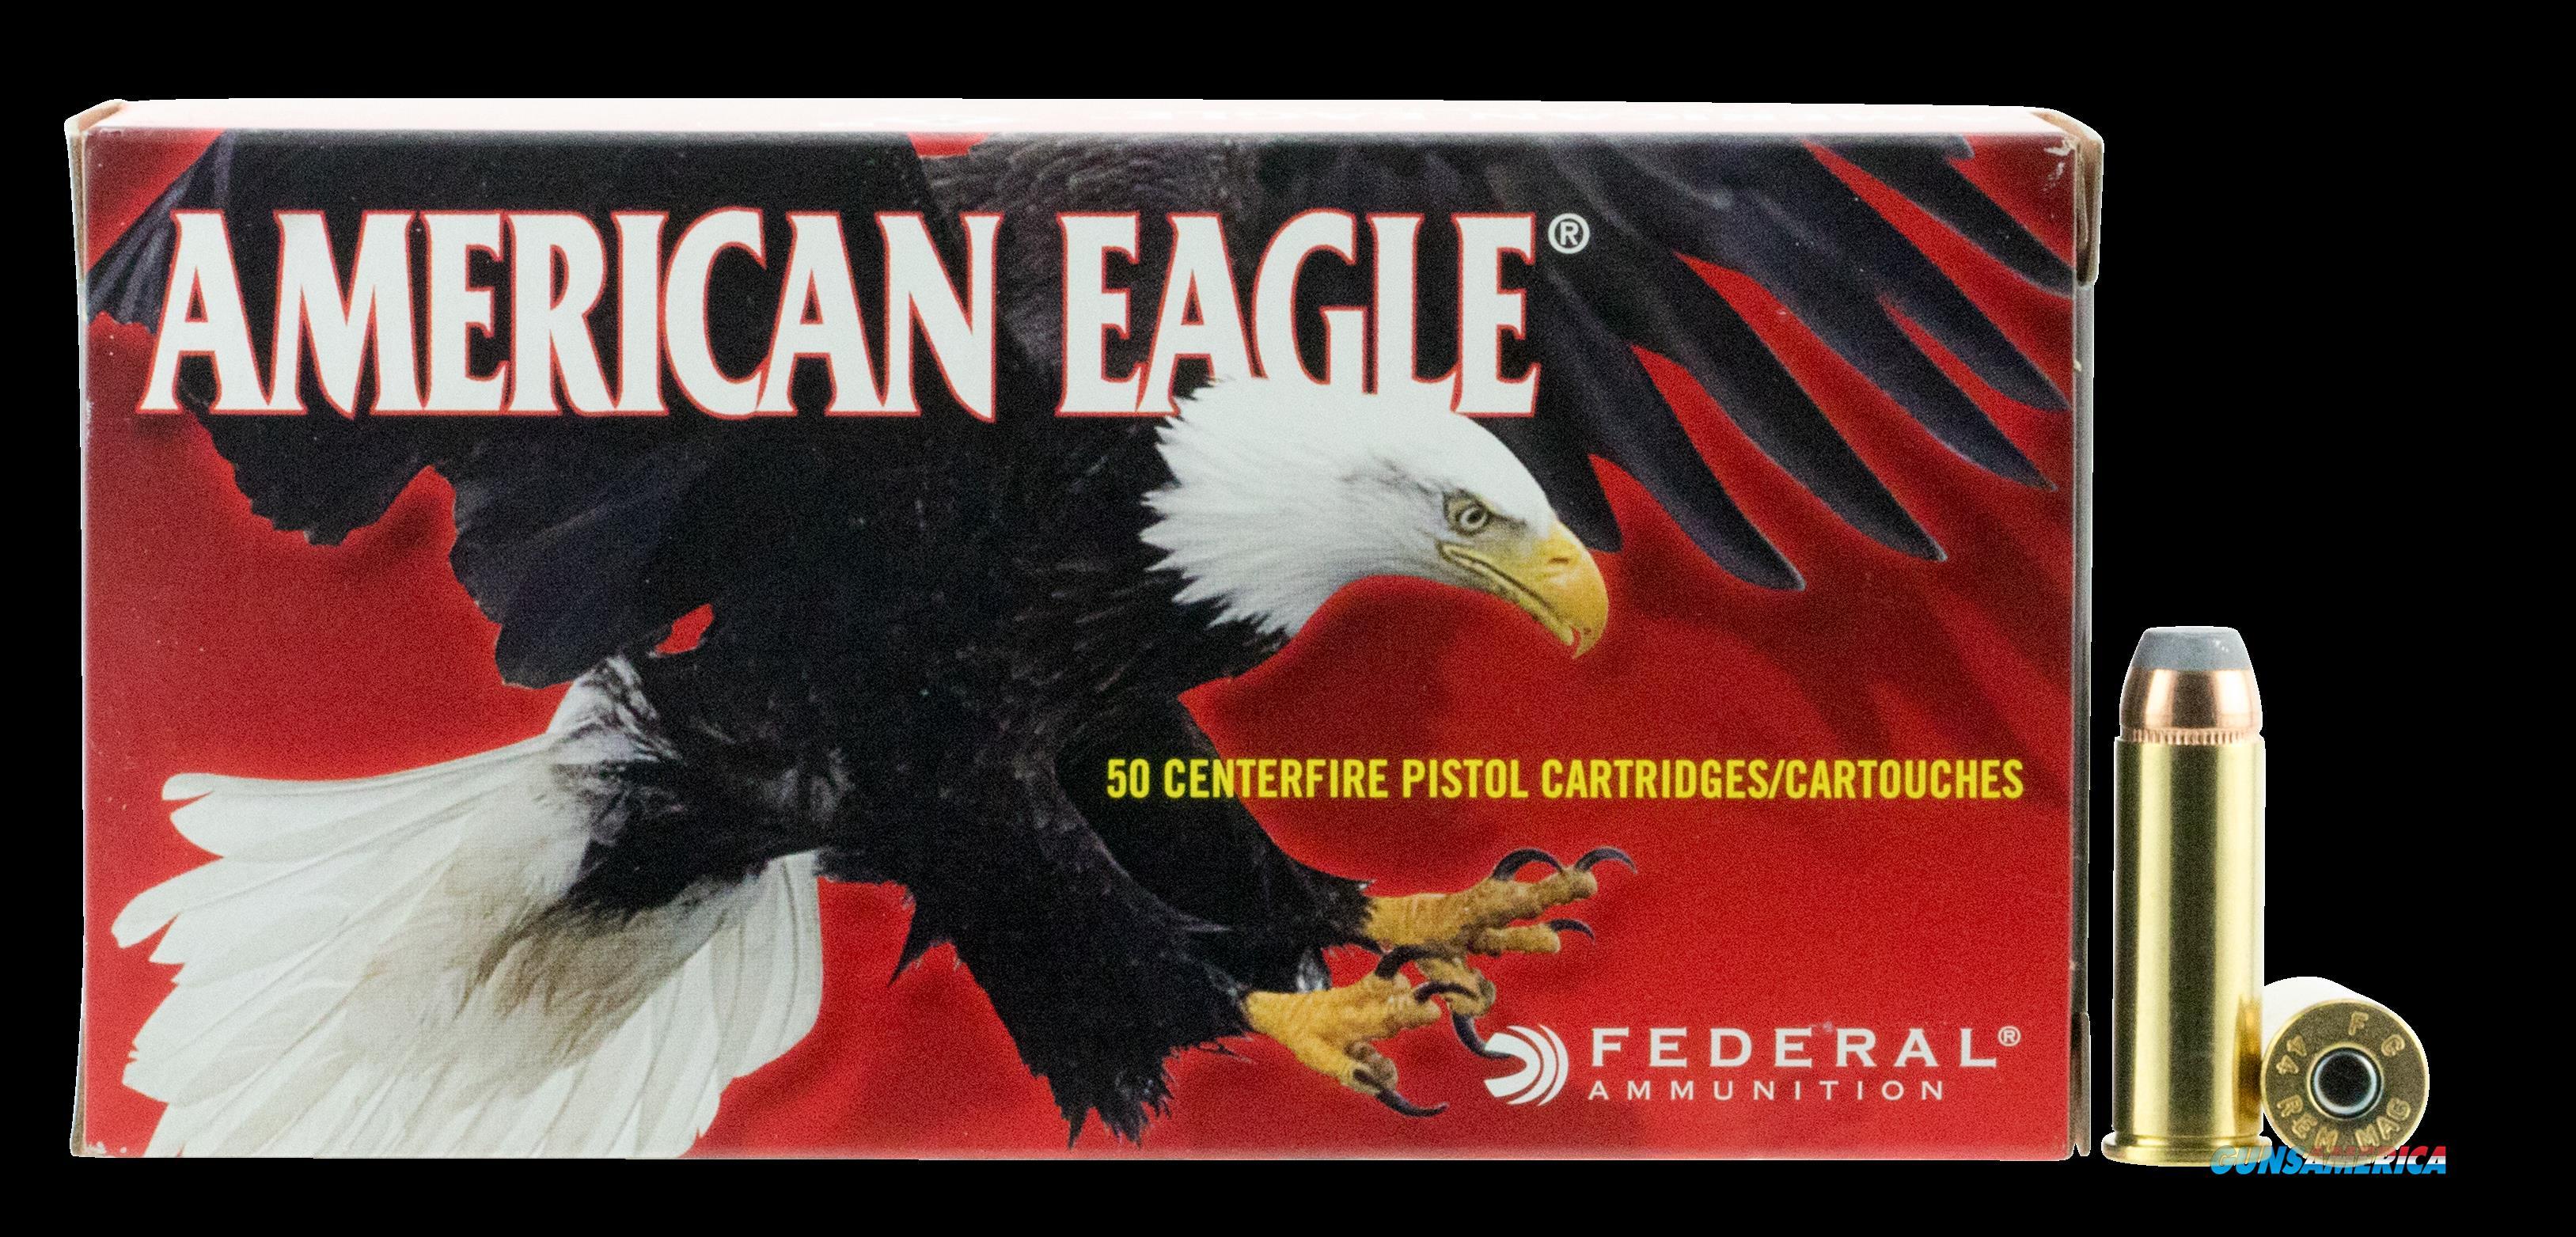 Federal American Eagle, Fed Ae44b         44mg     240 Sp          50-20  Guns > Pistols > 1911 Pistol Copies (non-Colt)